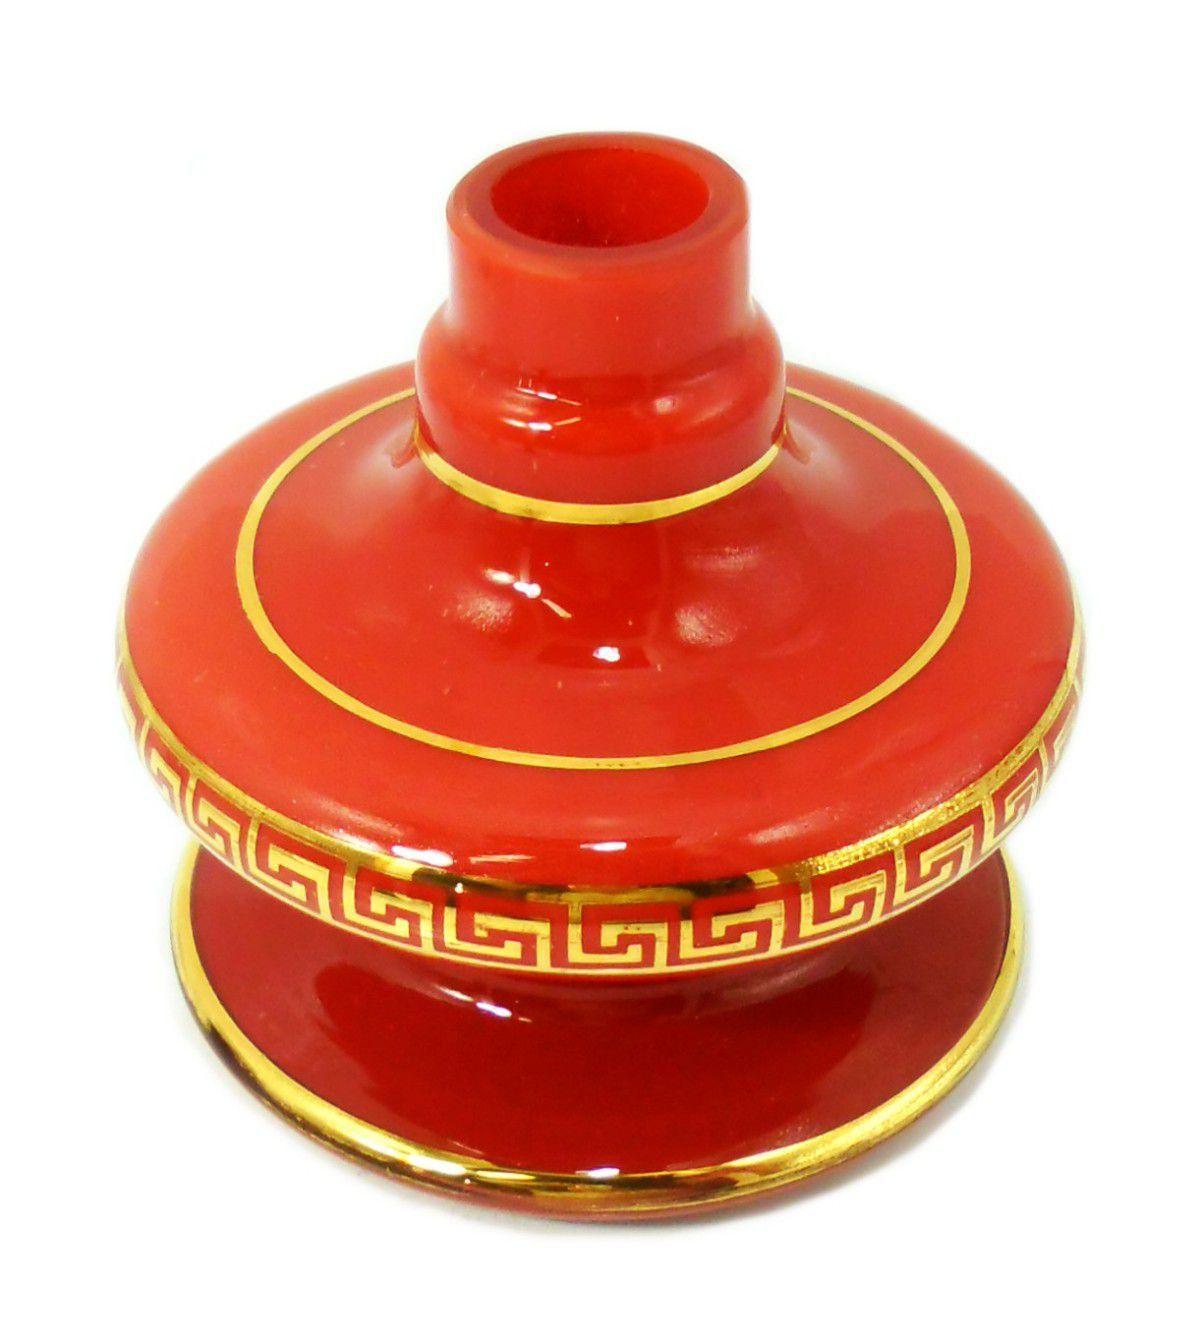 Vaso Shisha Glass Nix Grega - Vermelho